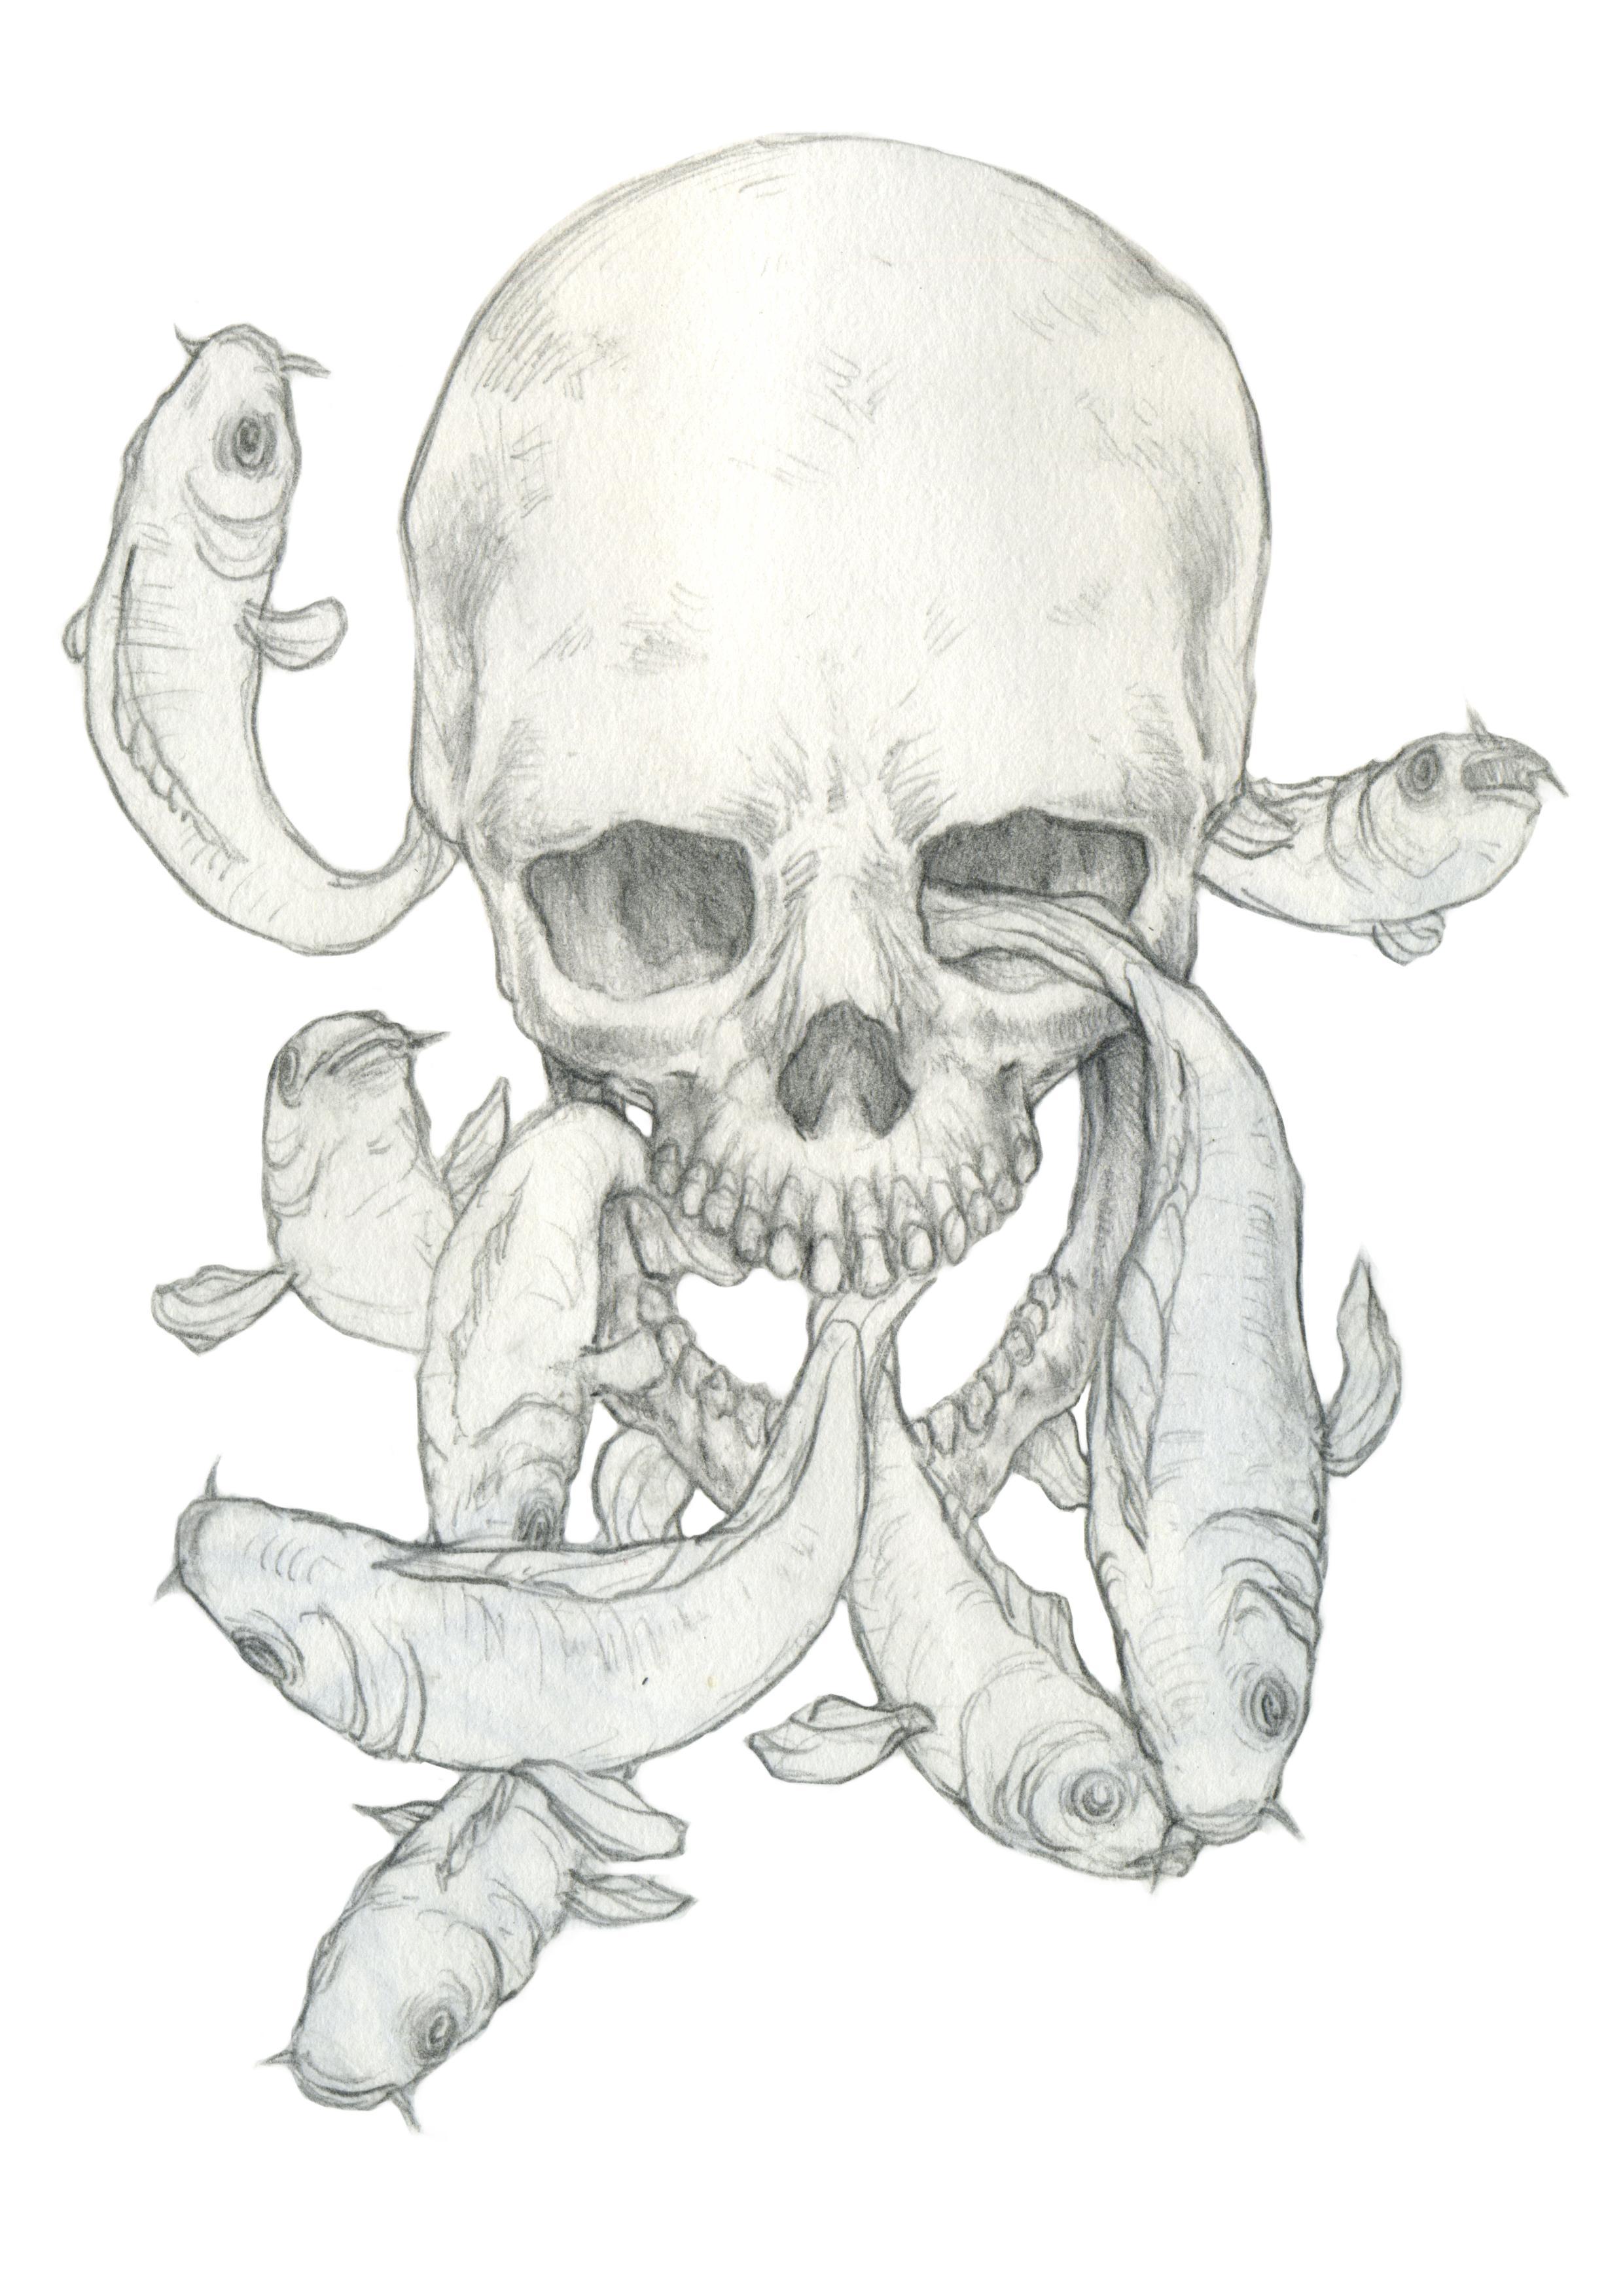 2480x3508 Skull Amp Fish Sketch Drawings Fish Sketch, Sketches